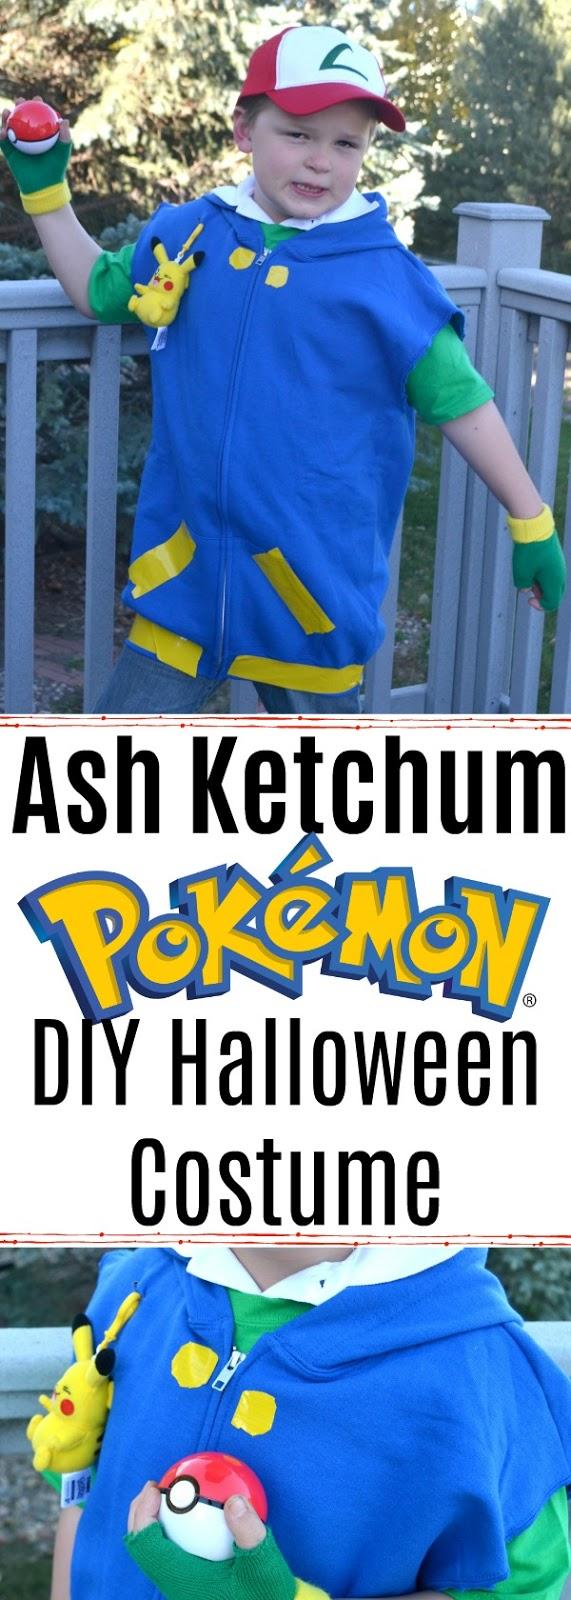 Ash Ketchum - Pokemon DIY Halloween Costume, Pokemon halloween costume, Ash Ketchum halloween costume, DIY Ash Ketchum costume, Pokemon costumes, DIY pokemon costume, Pokemon trainer costume, DIY halloween costumes